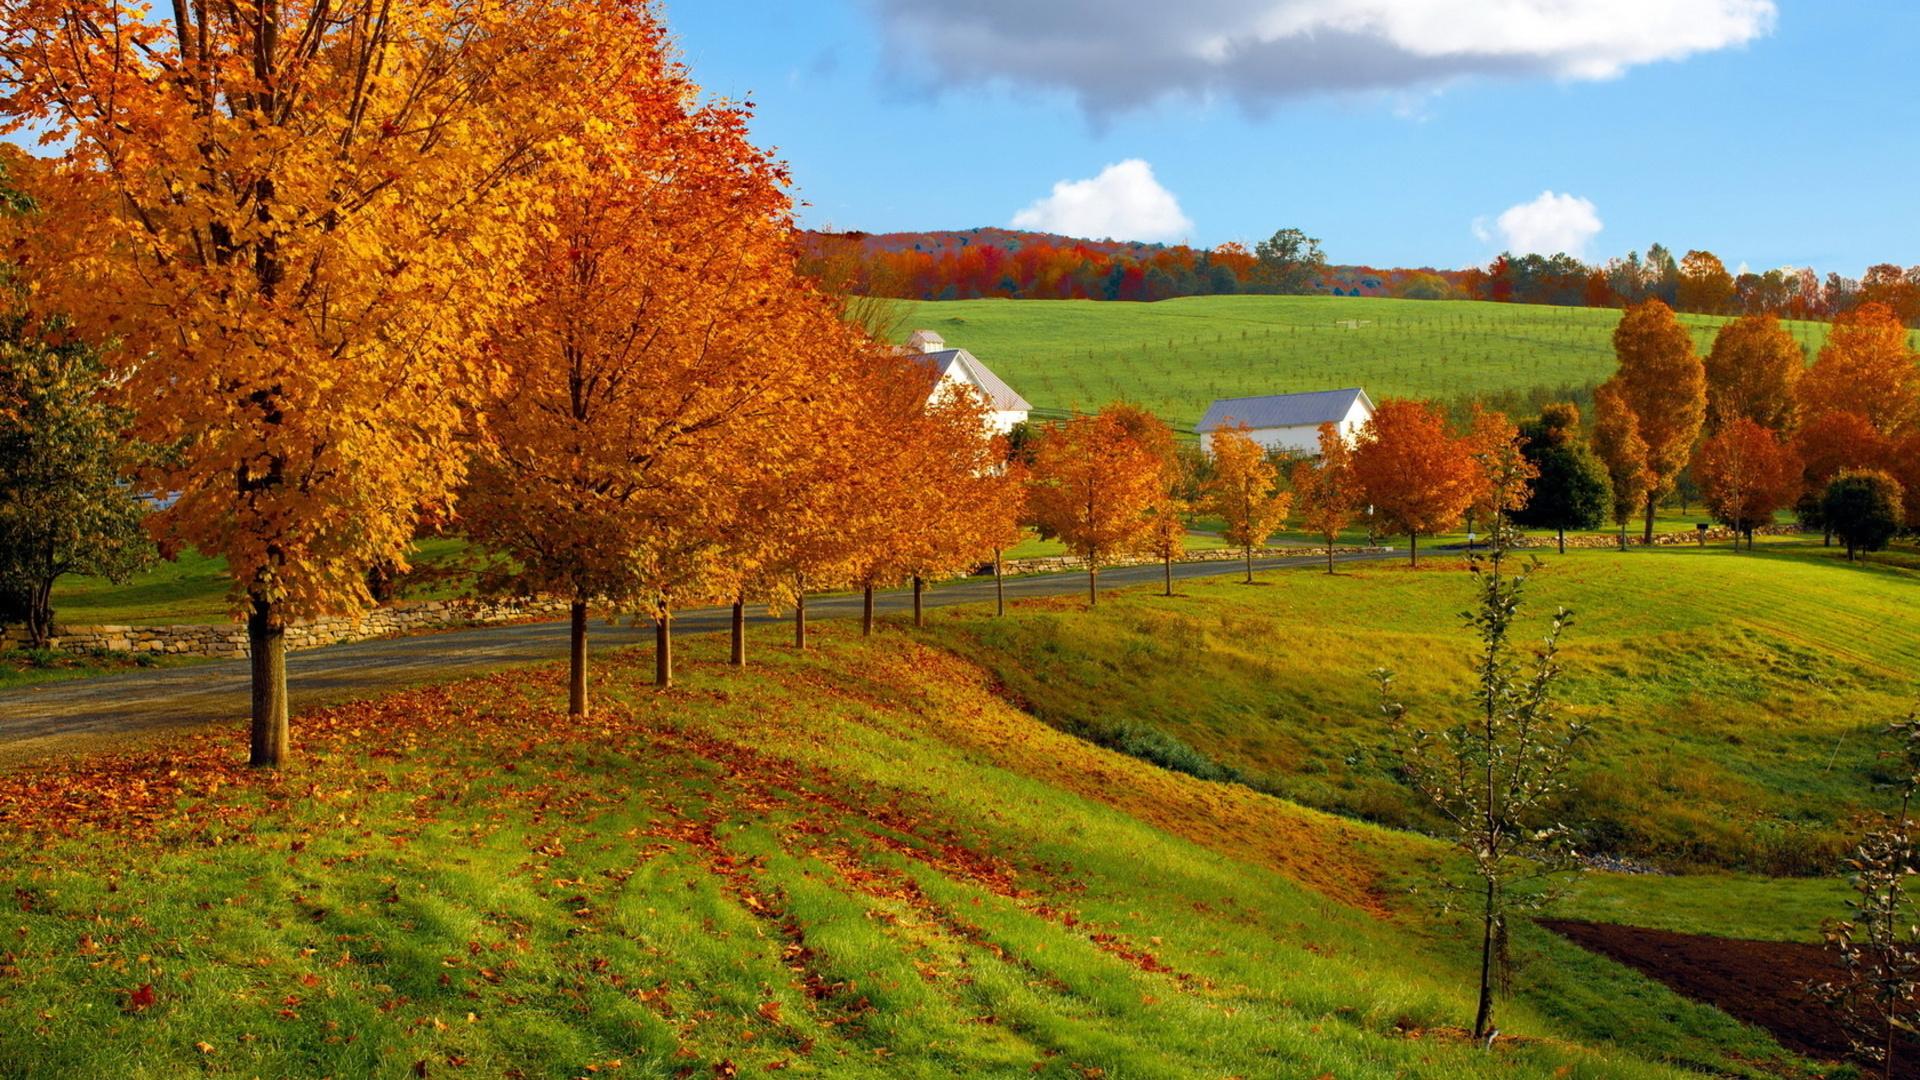 Landscape HD Wallpaper | Background Image | 1920x1080 | ID ...